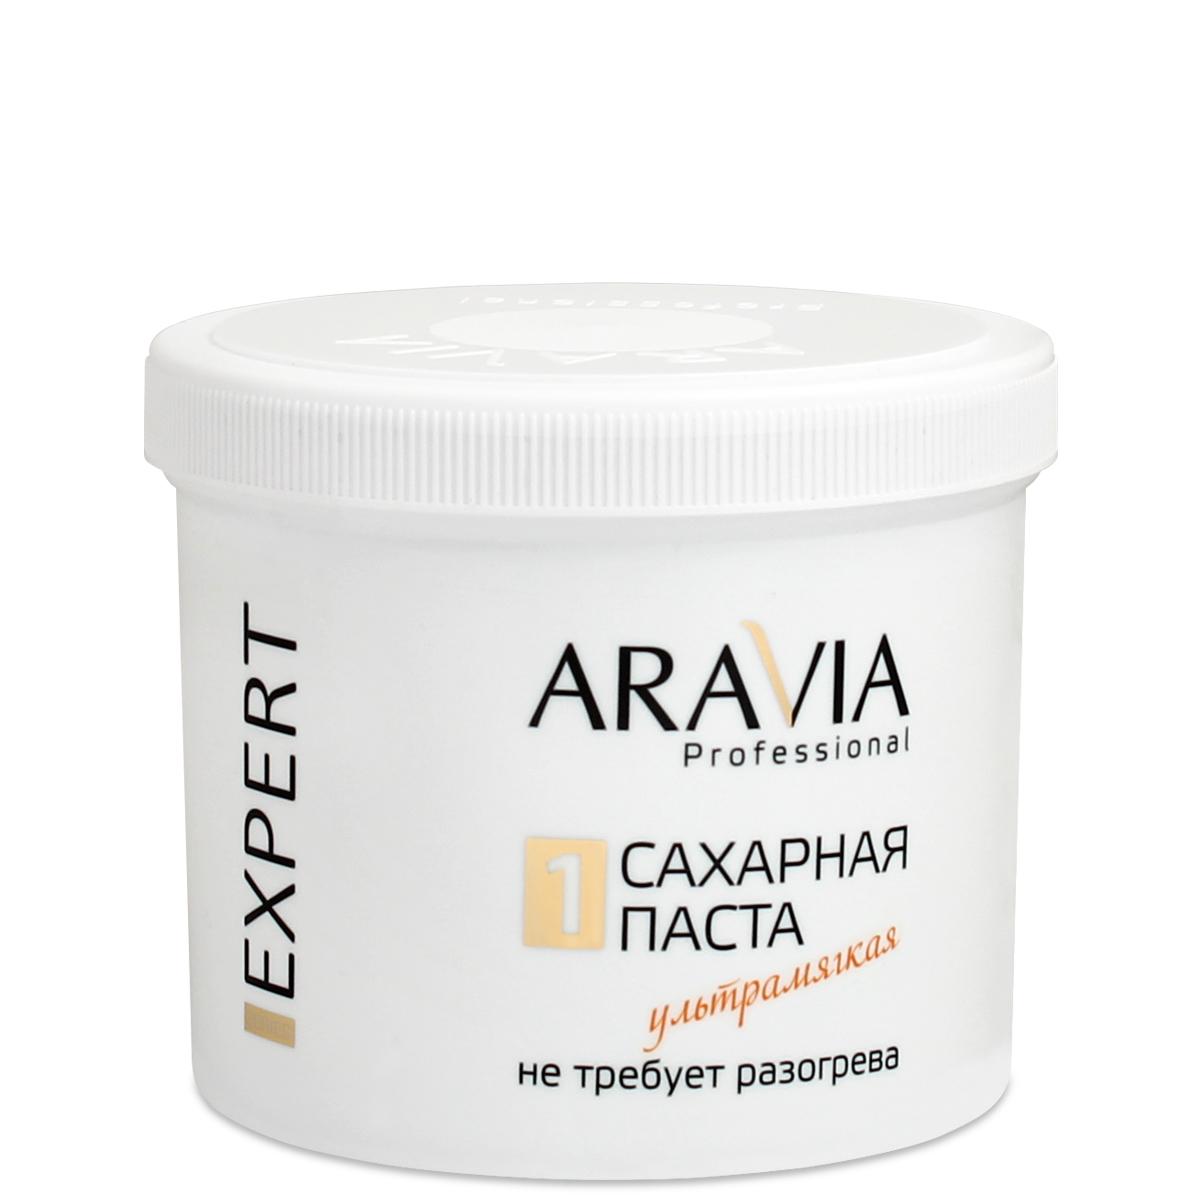 ARAVIA Паста сахарная для депиляции Ультрамягкая / EXPERT 750гр